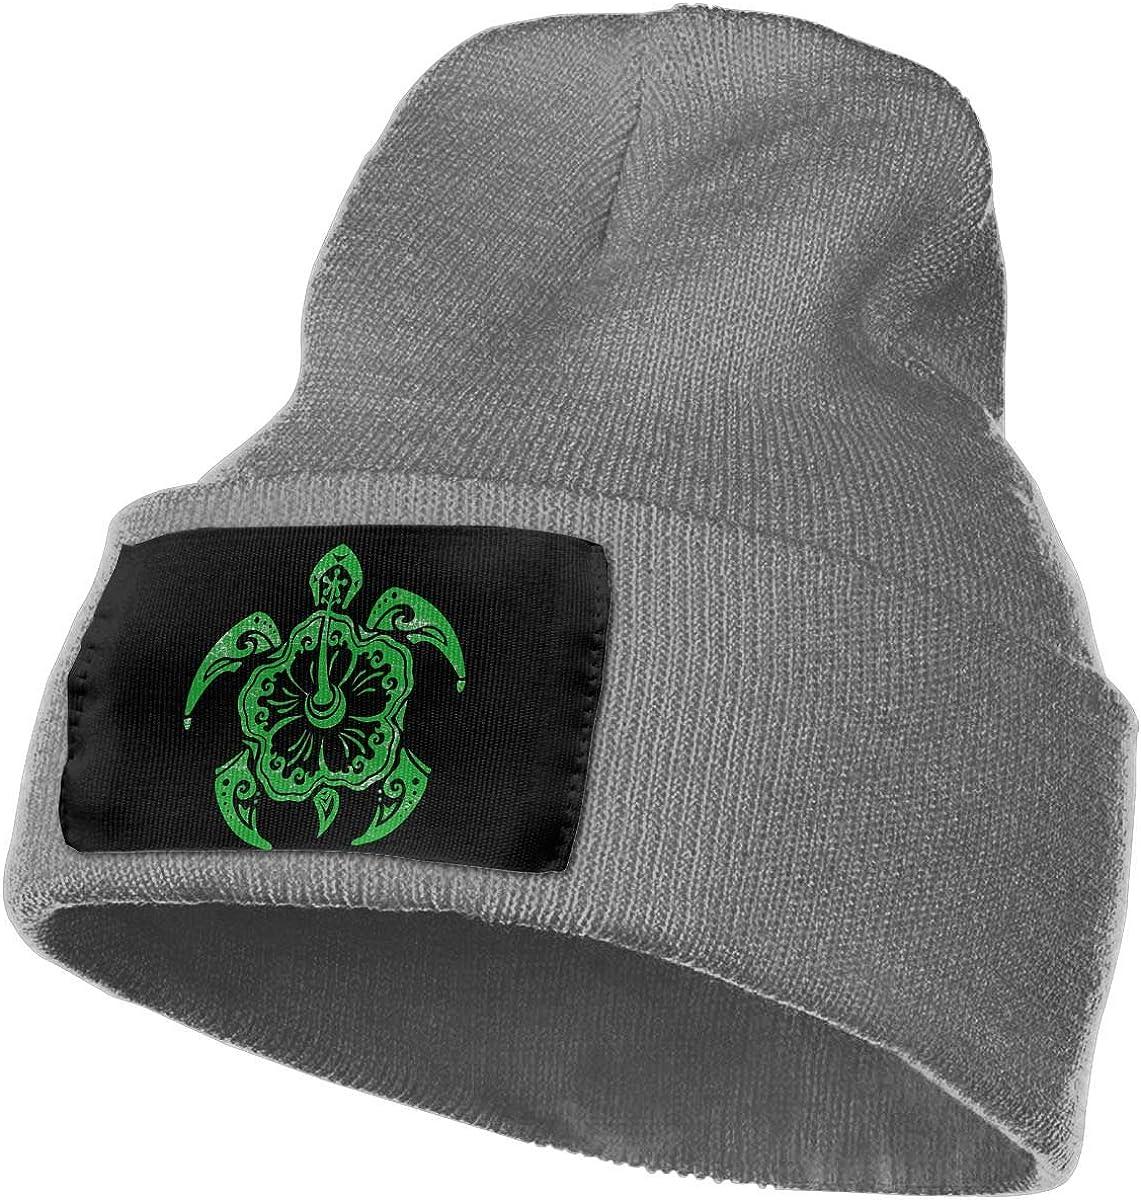 Mens and Womens 100/% Acrylic Knit Hat Cap Hawaiian Tribal Turtle Original Skull Beanie